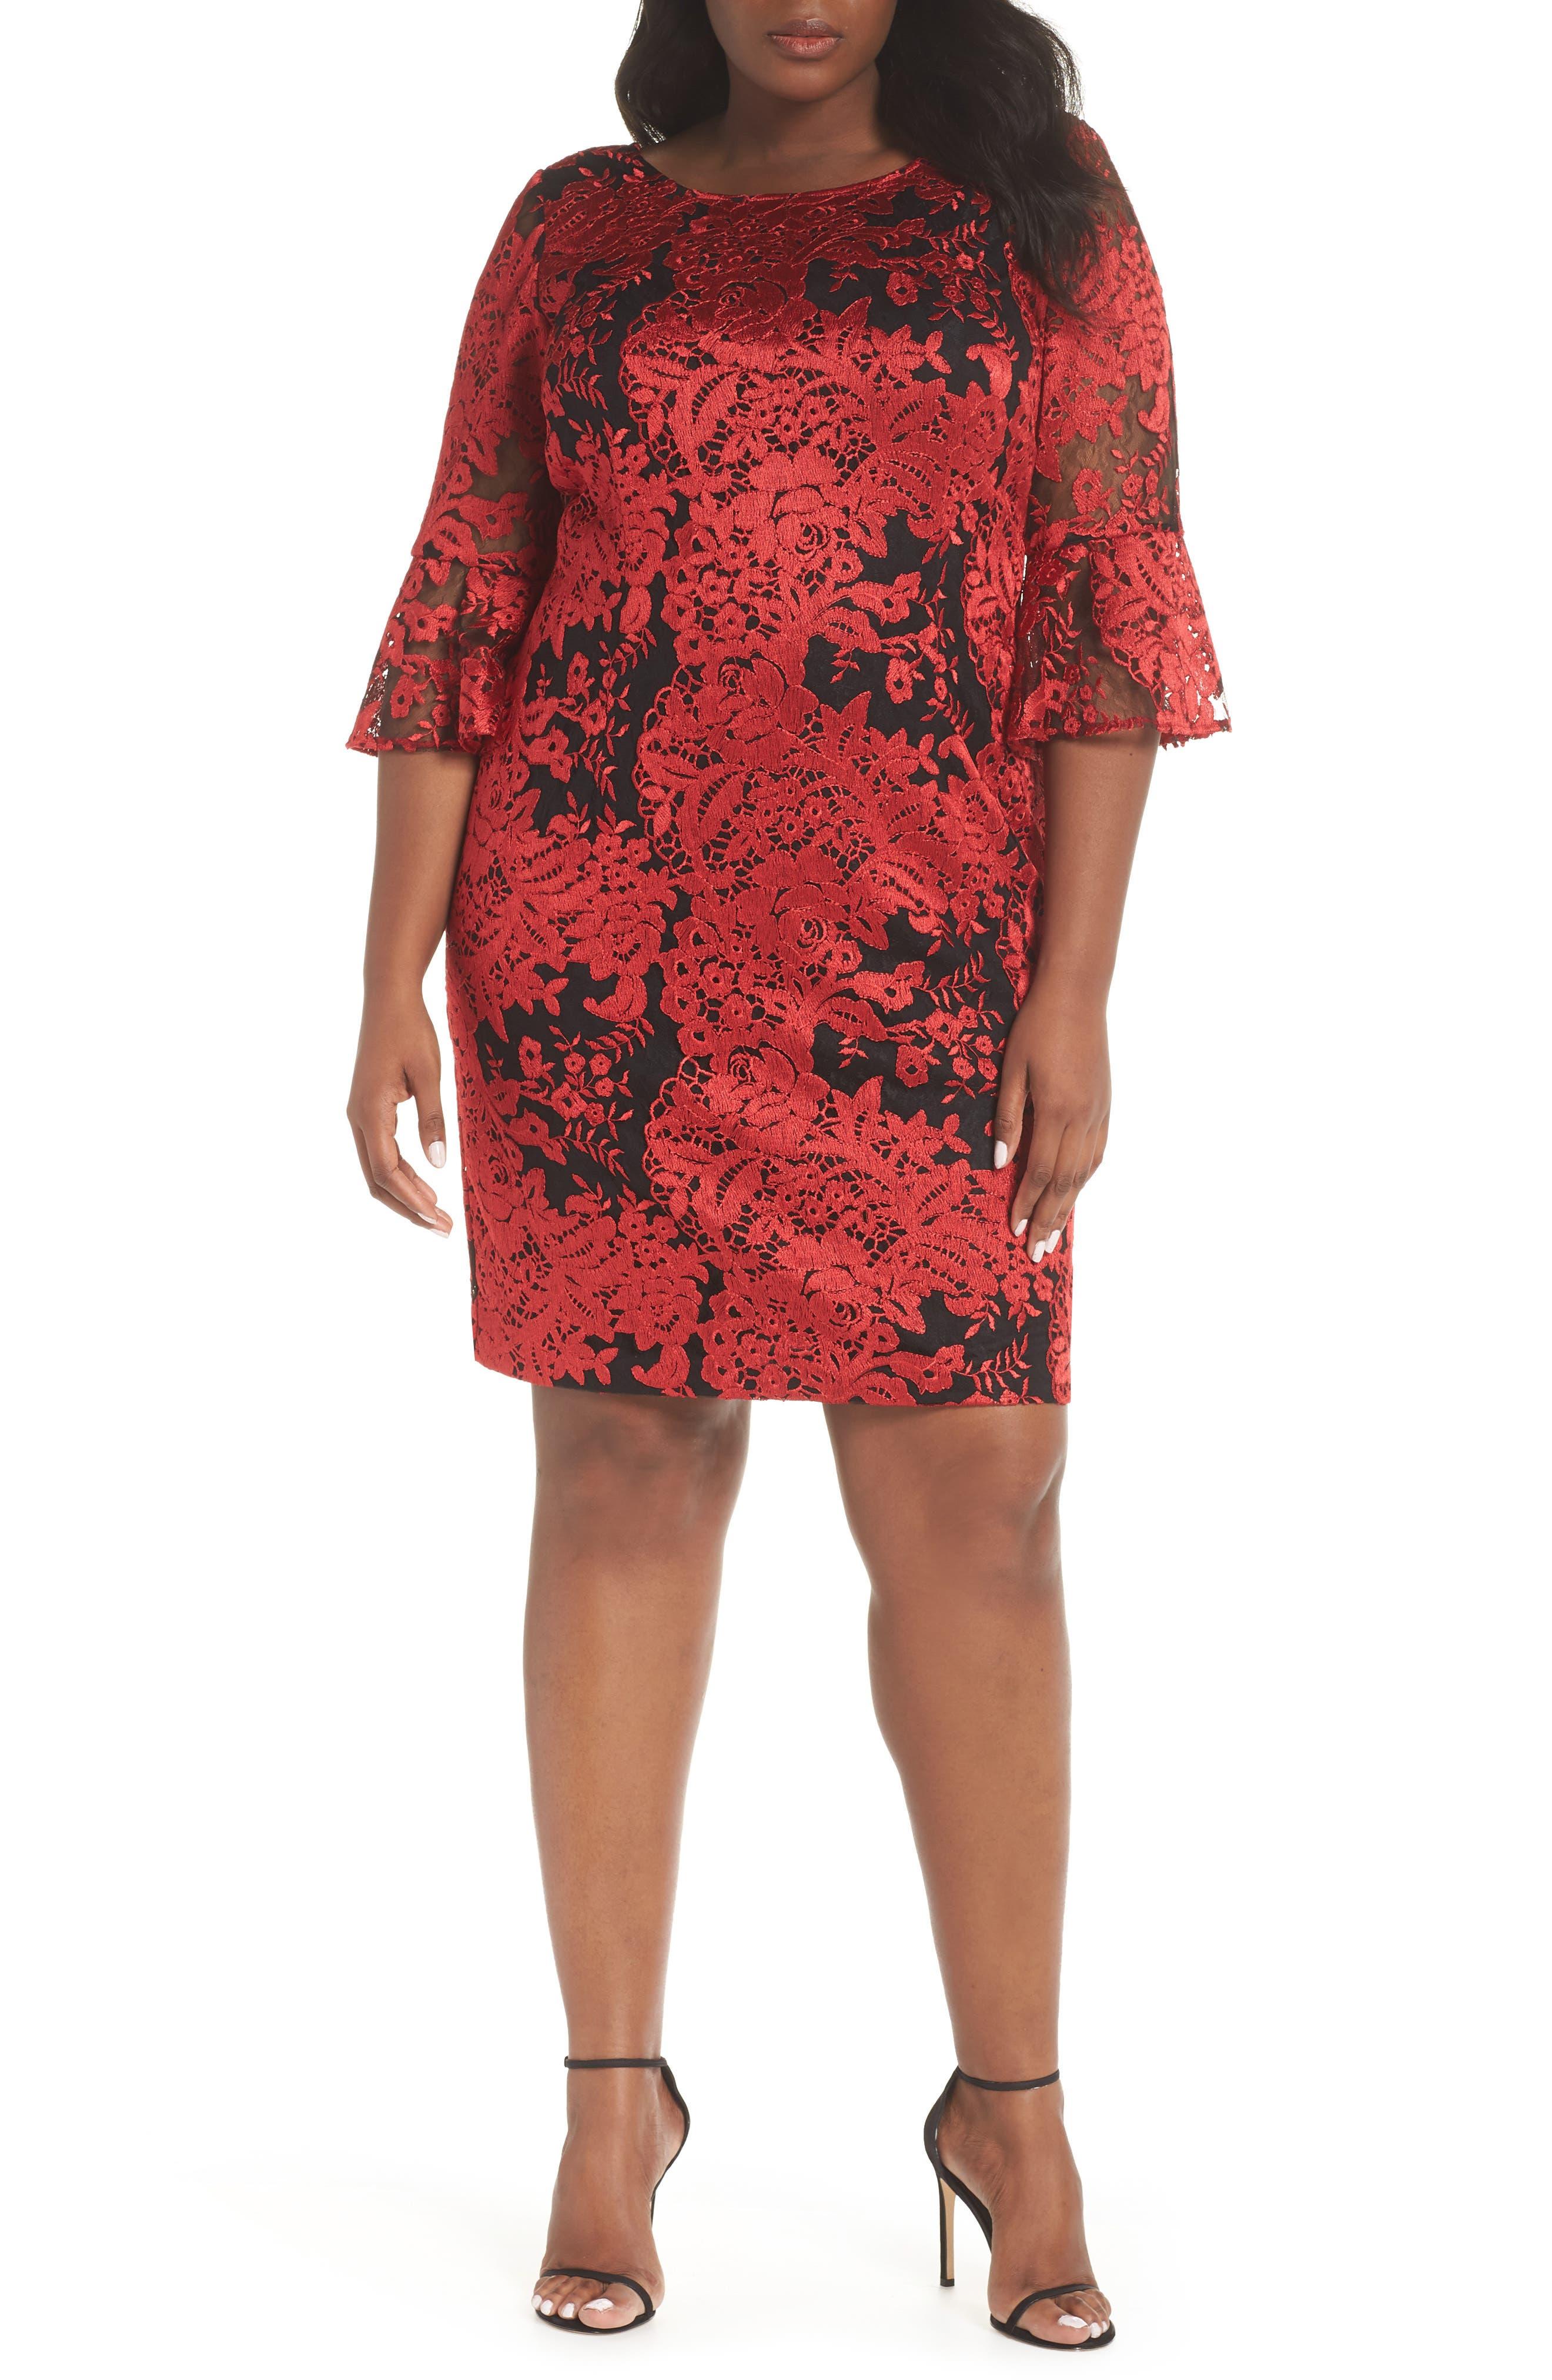 Plus Size Alex Evenings Embroidered Lace Shift Dress, Black